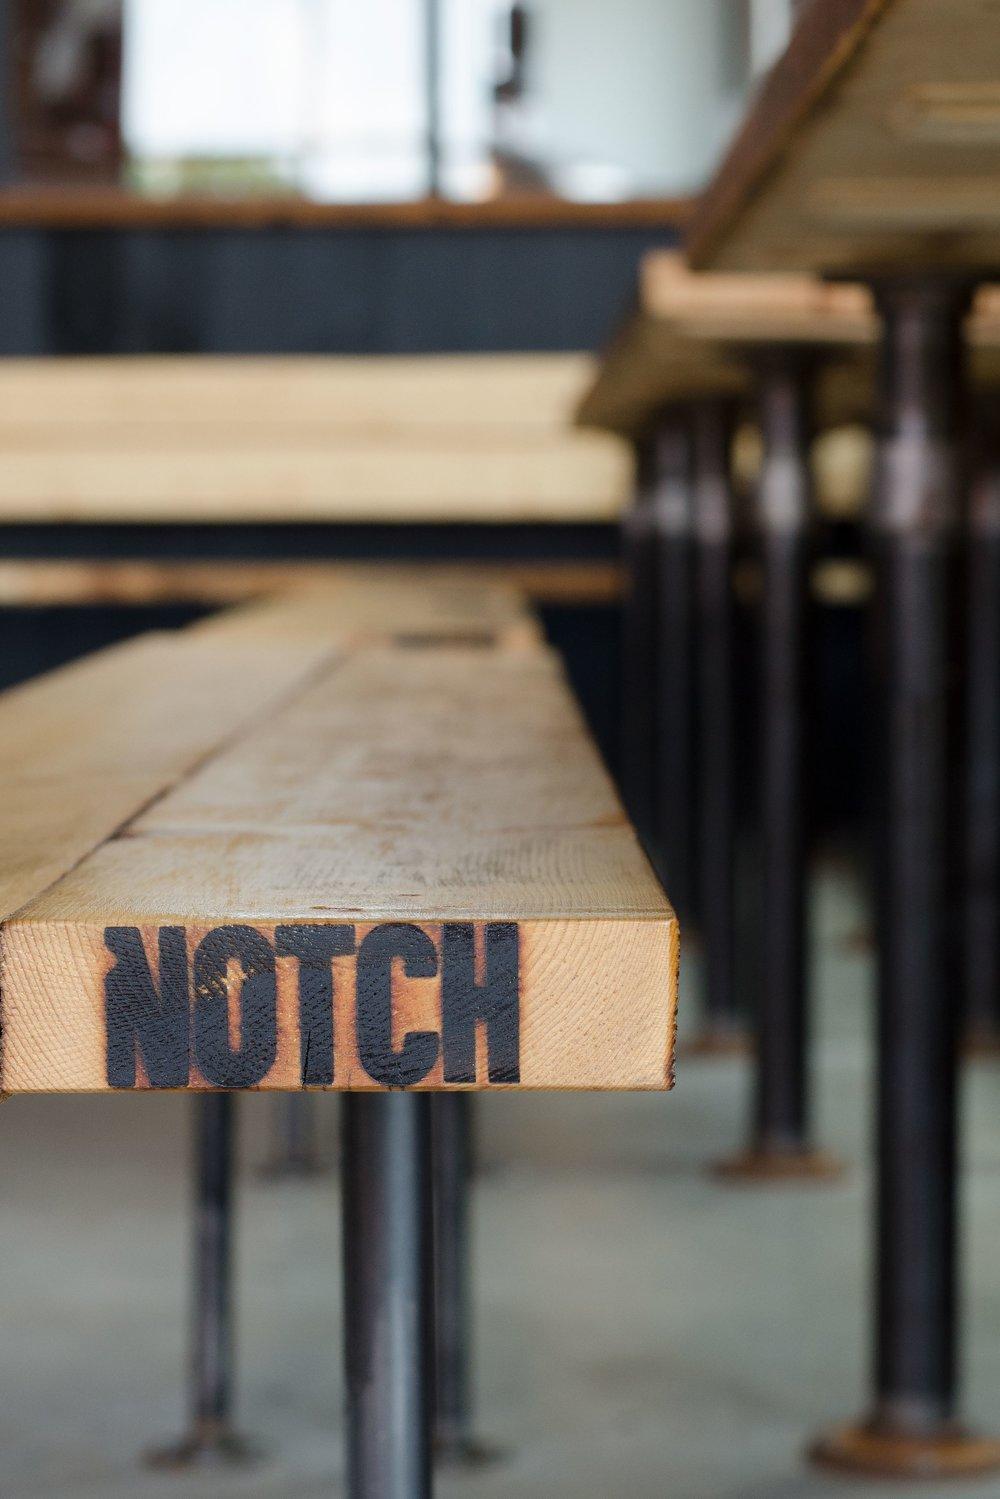 Notch-23.jpg